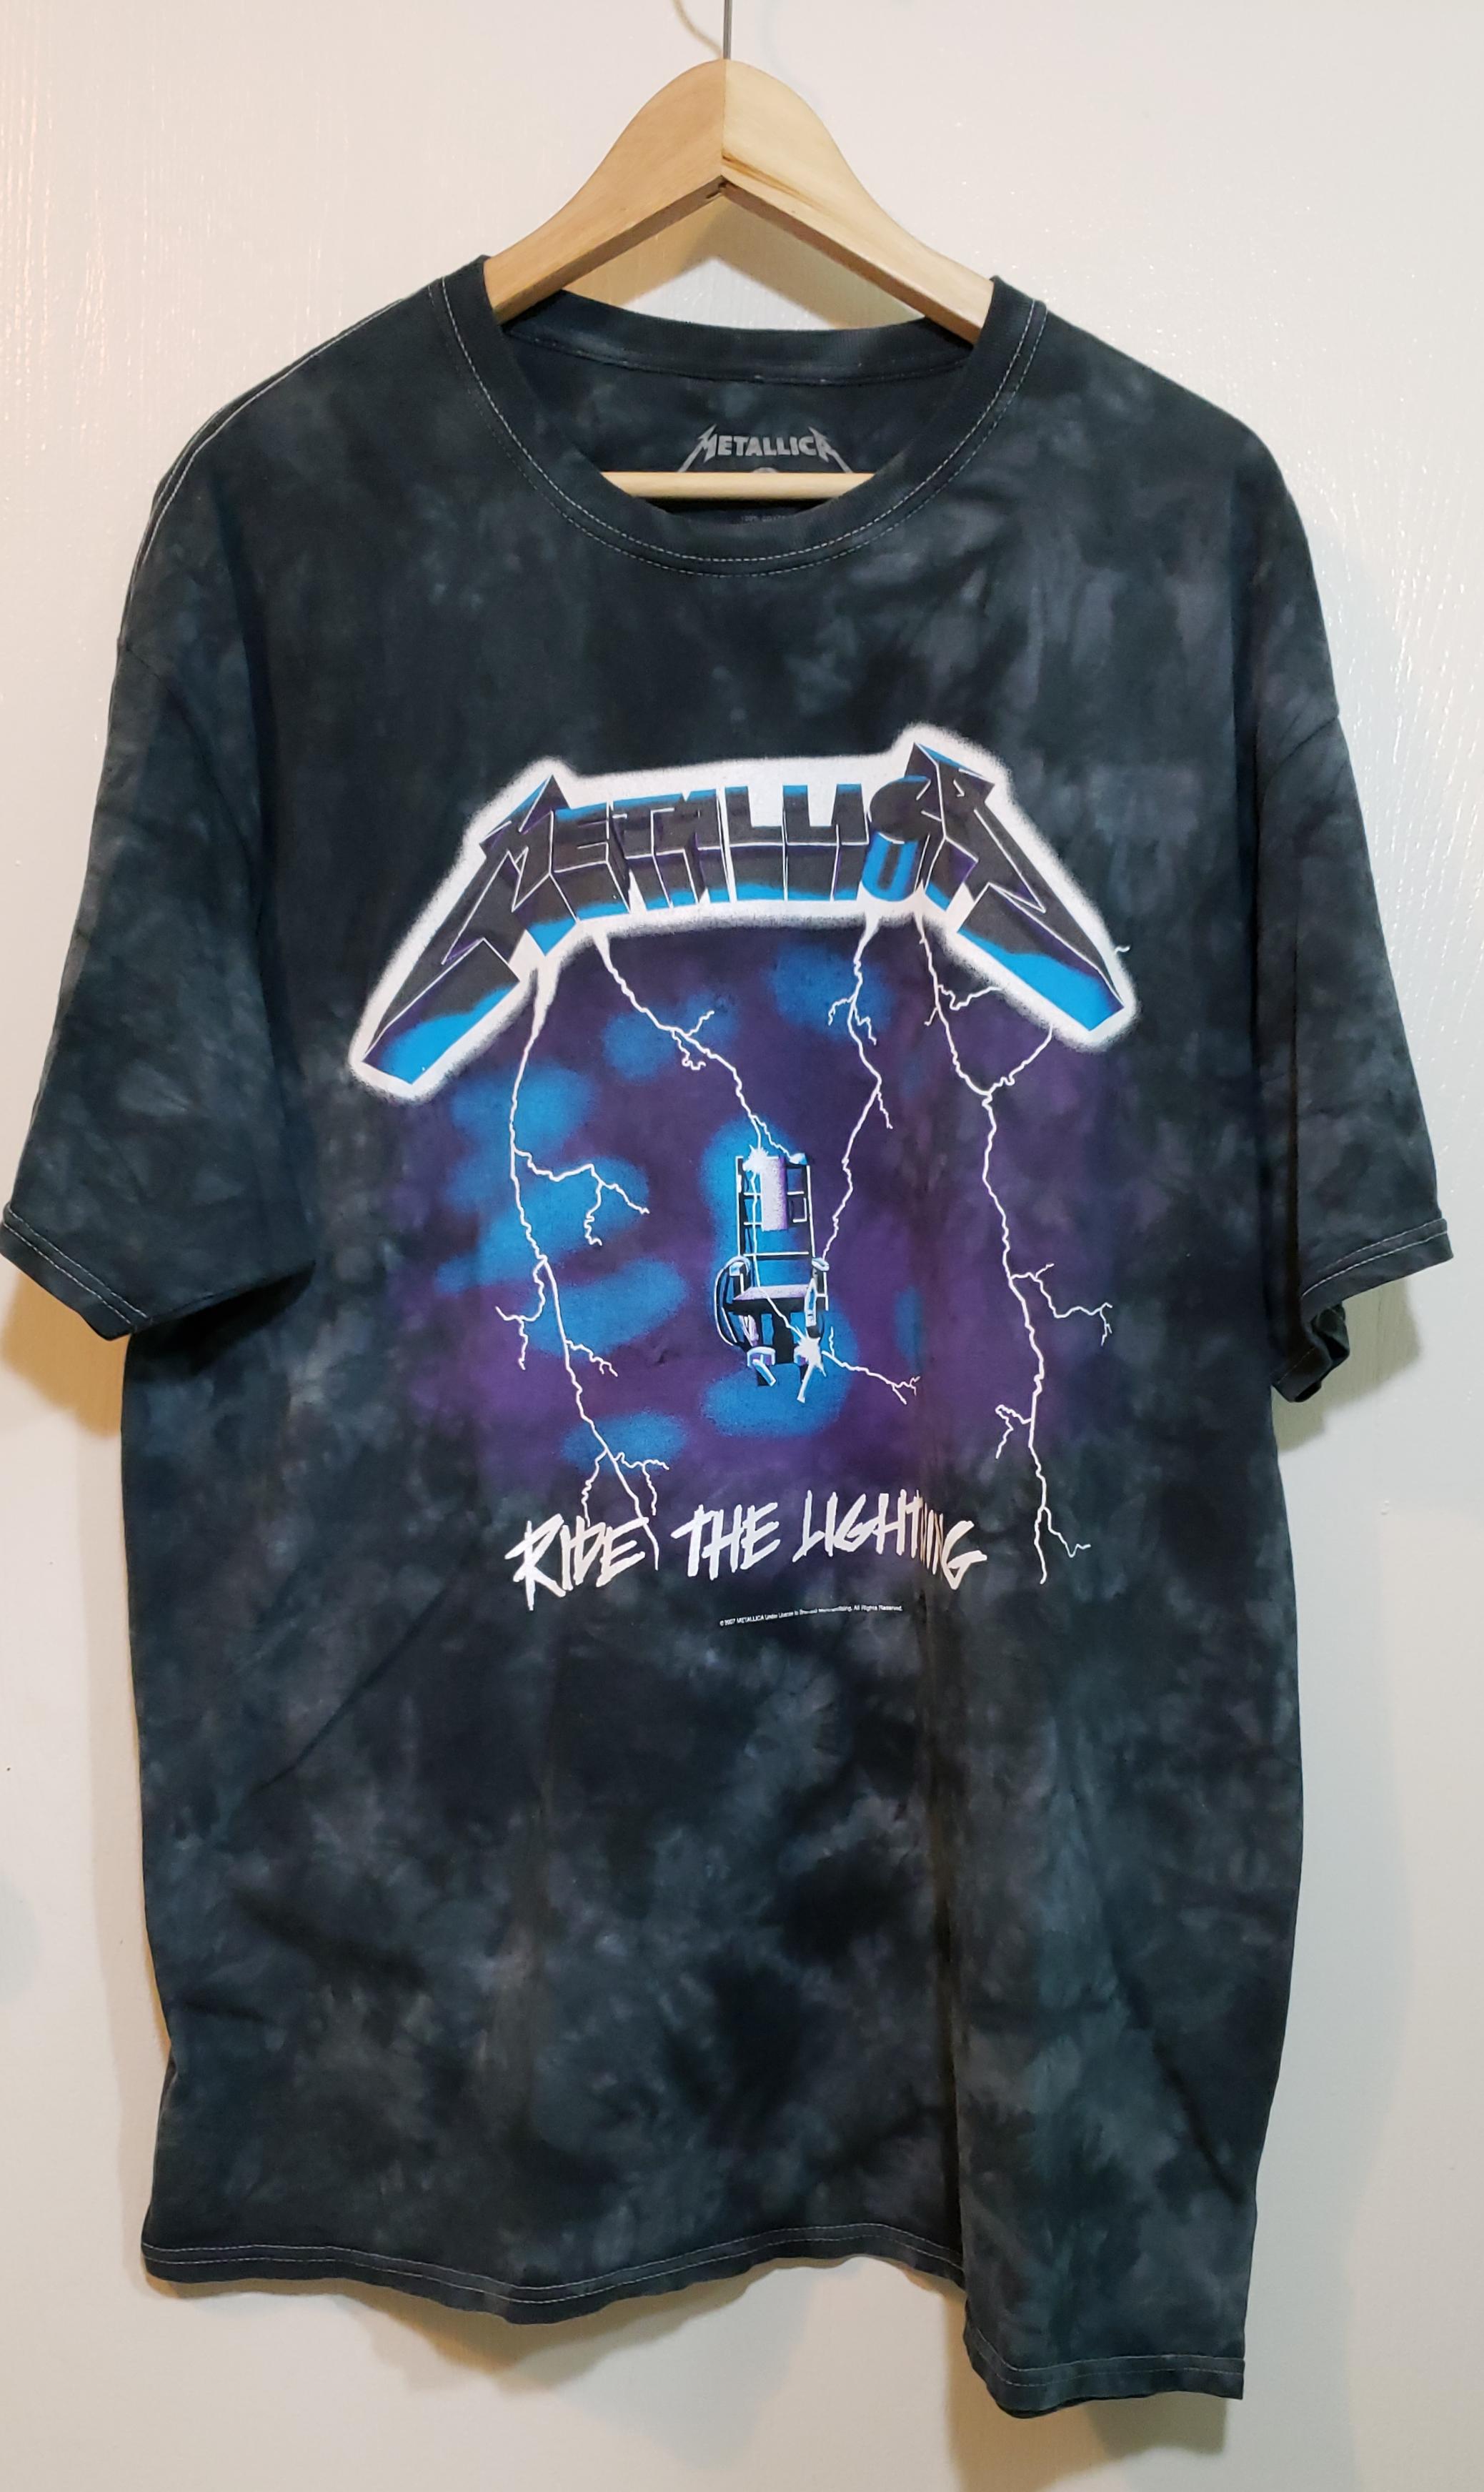 7946ea8522d0 Band Tee 2007 Metallica Ride The Lightning Tie Dye Graphic T Shirt ...